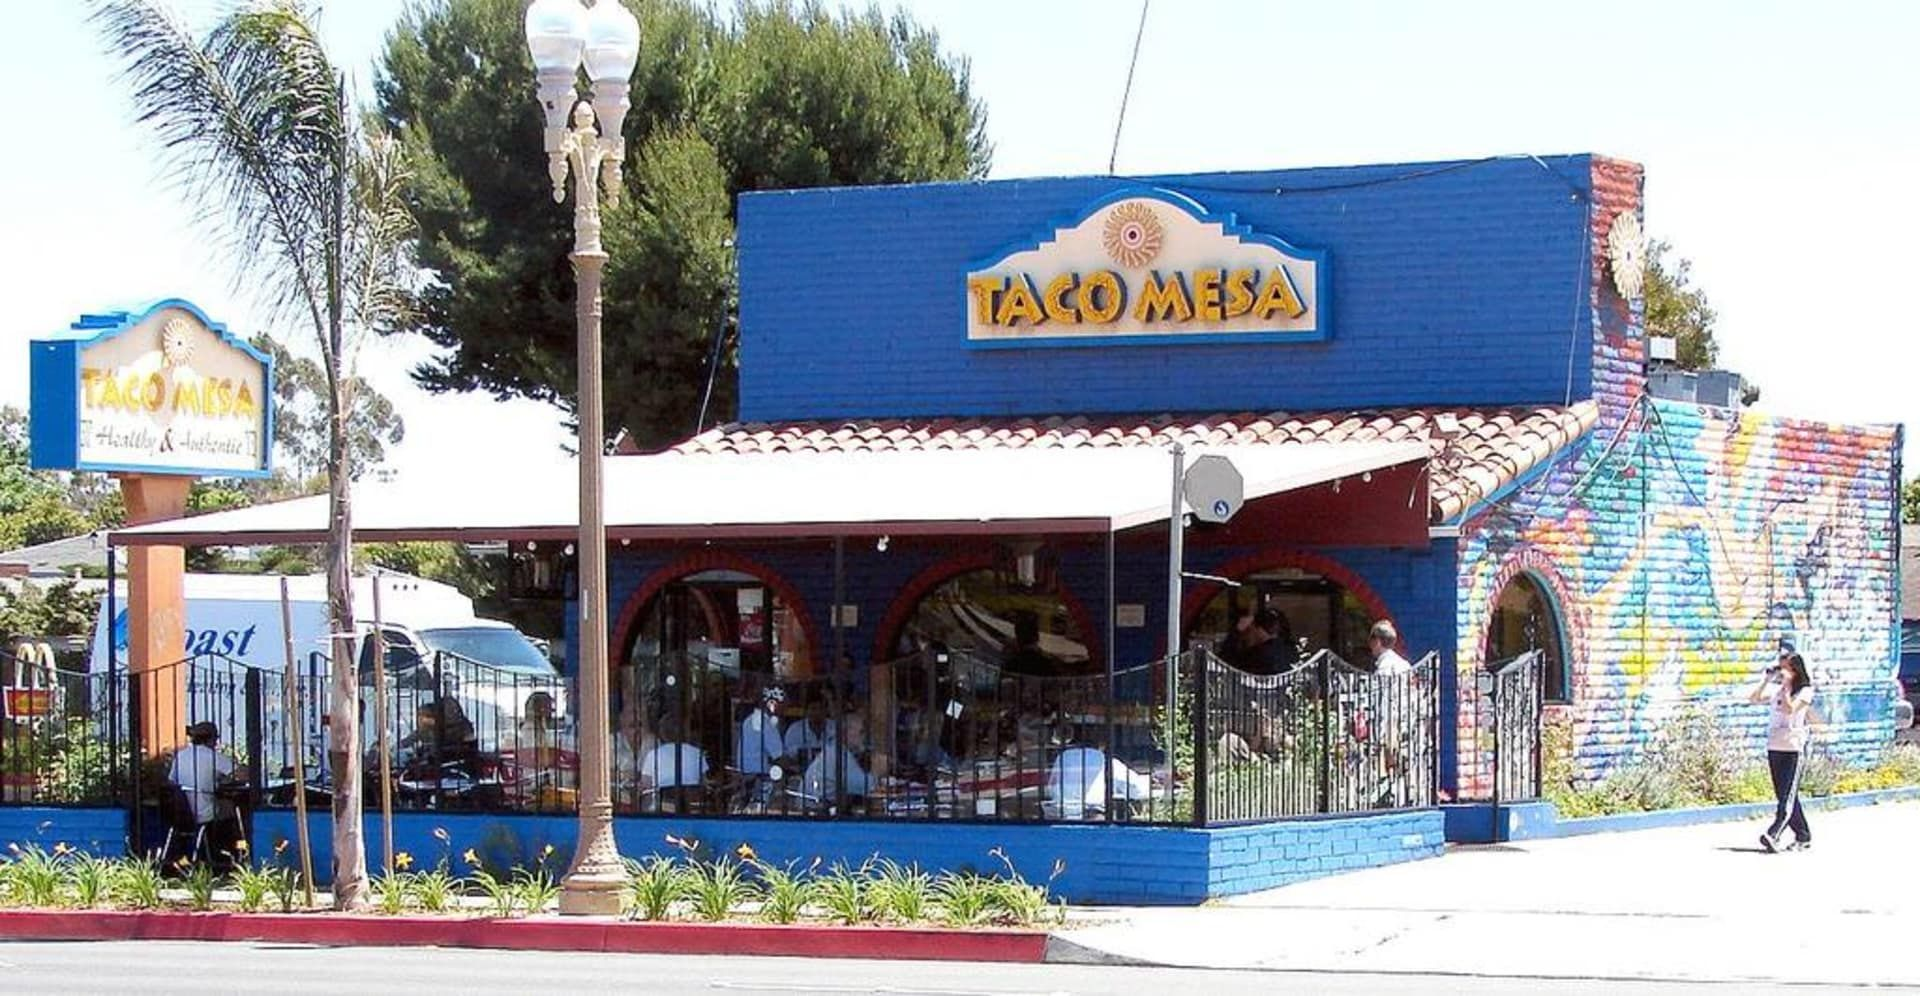 Gallery tacos mesa restaurant